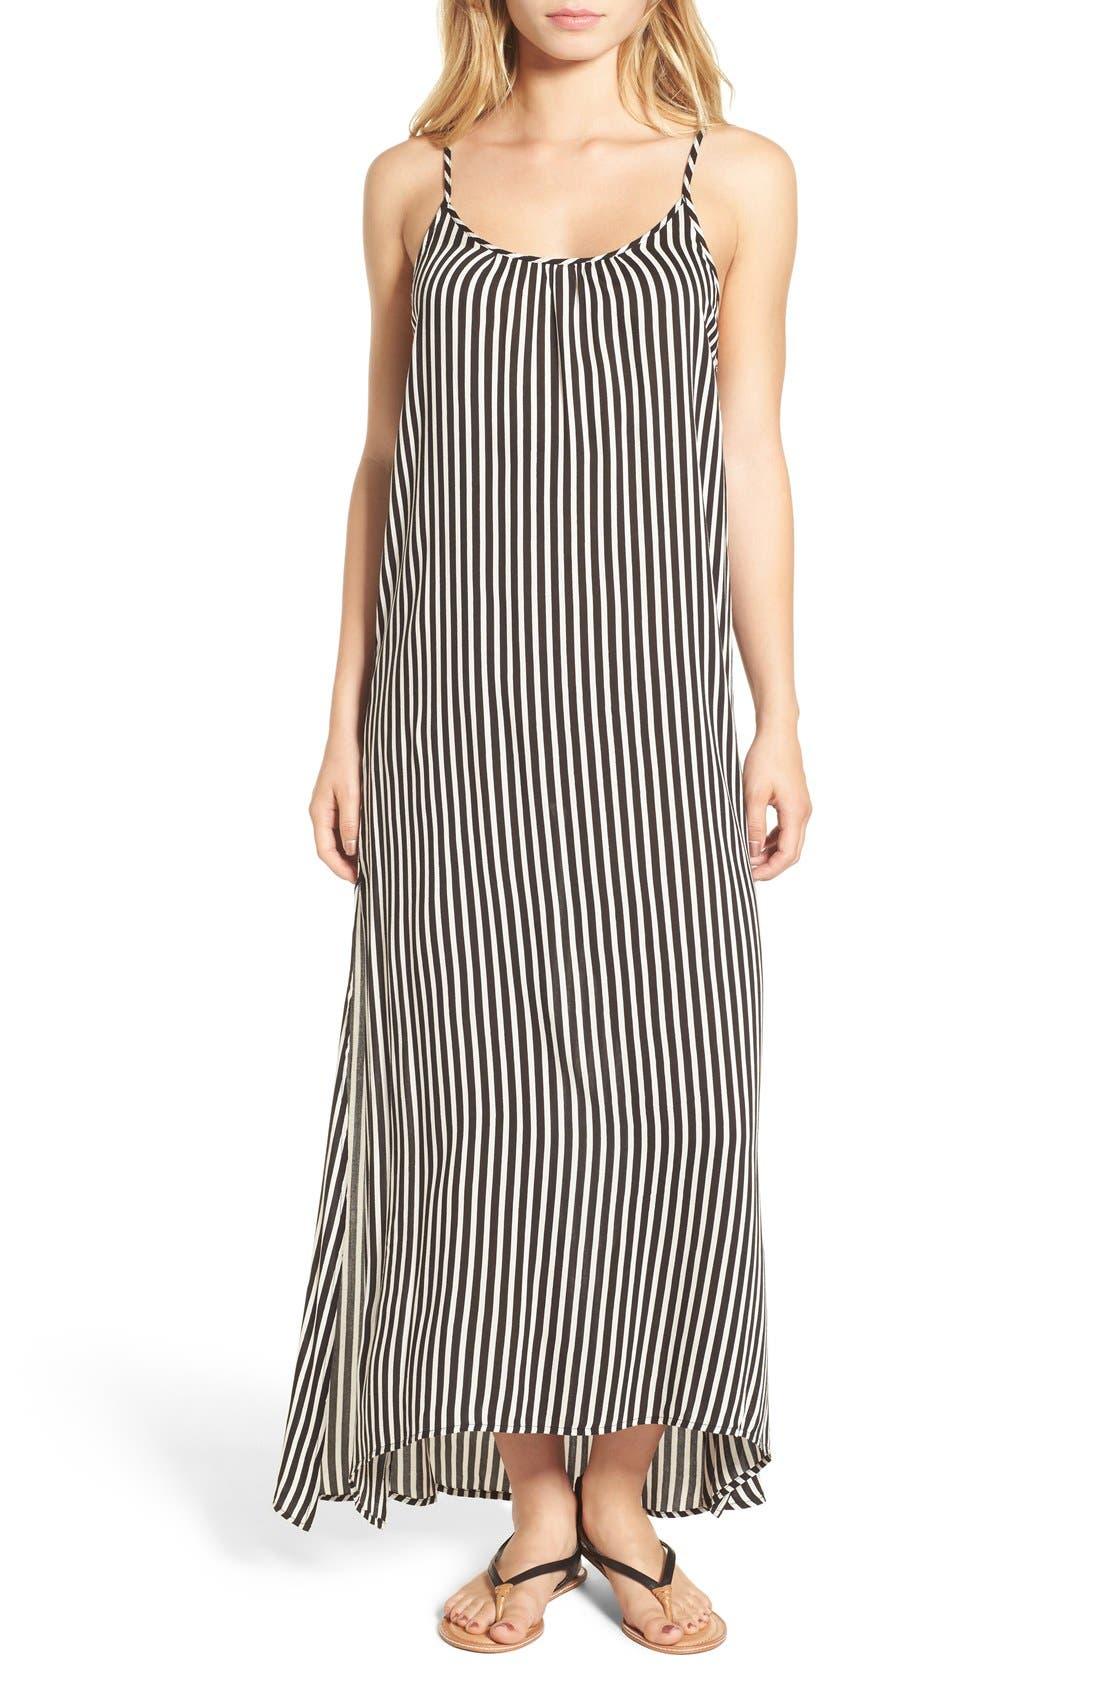 Alternate Image 1 Selected - Billabong 'Easy Does It' Stripe Maxi Dress